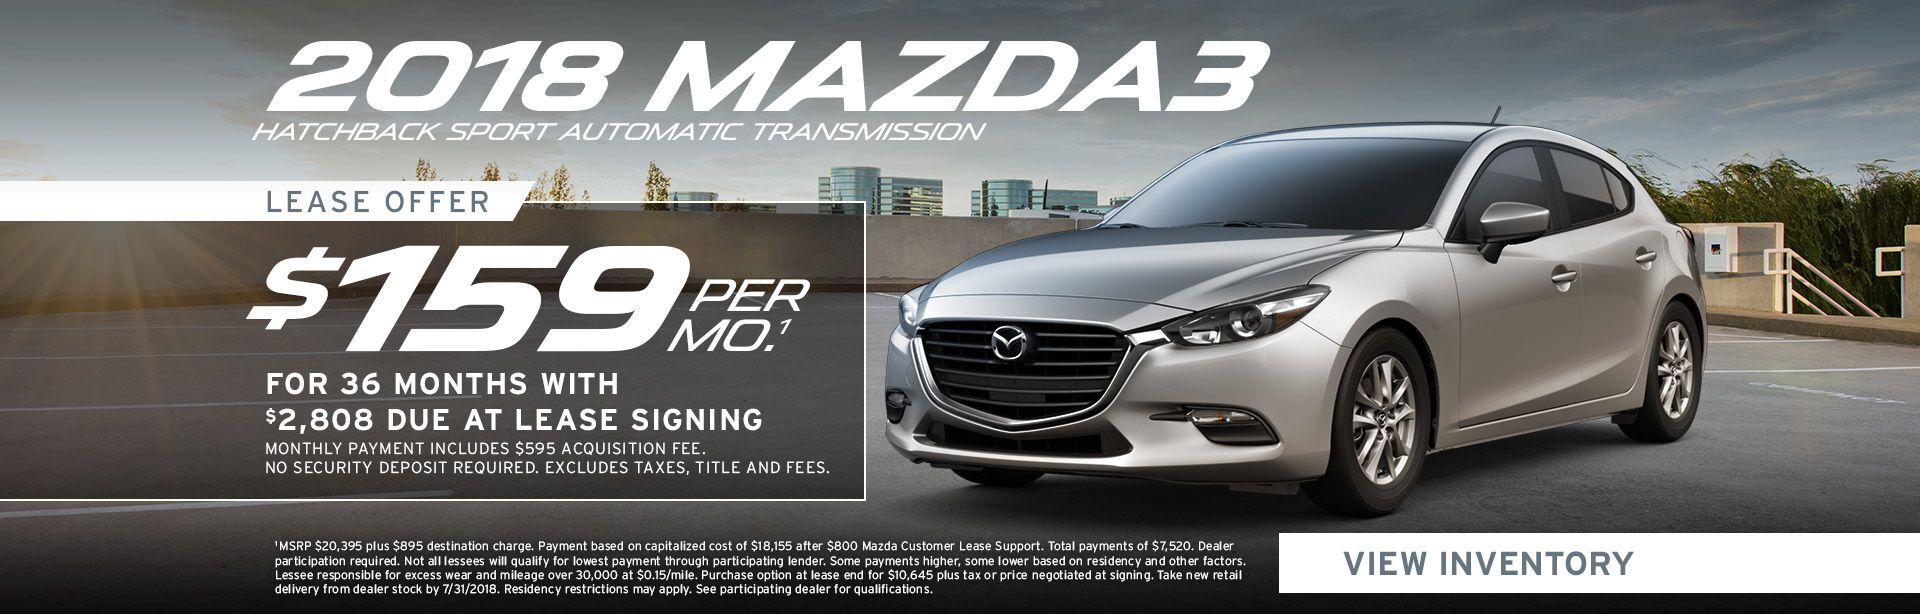 Mazda 3 Hatchback Specials